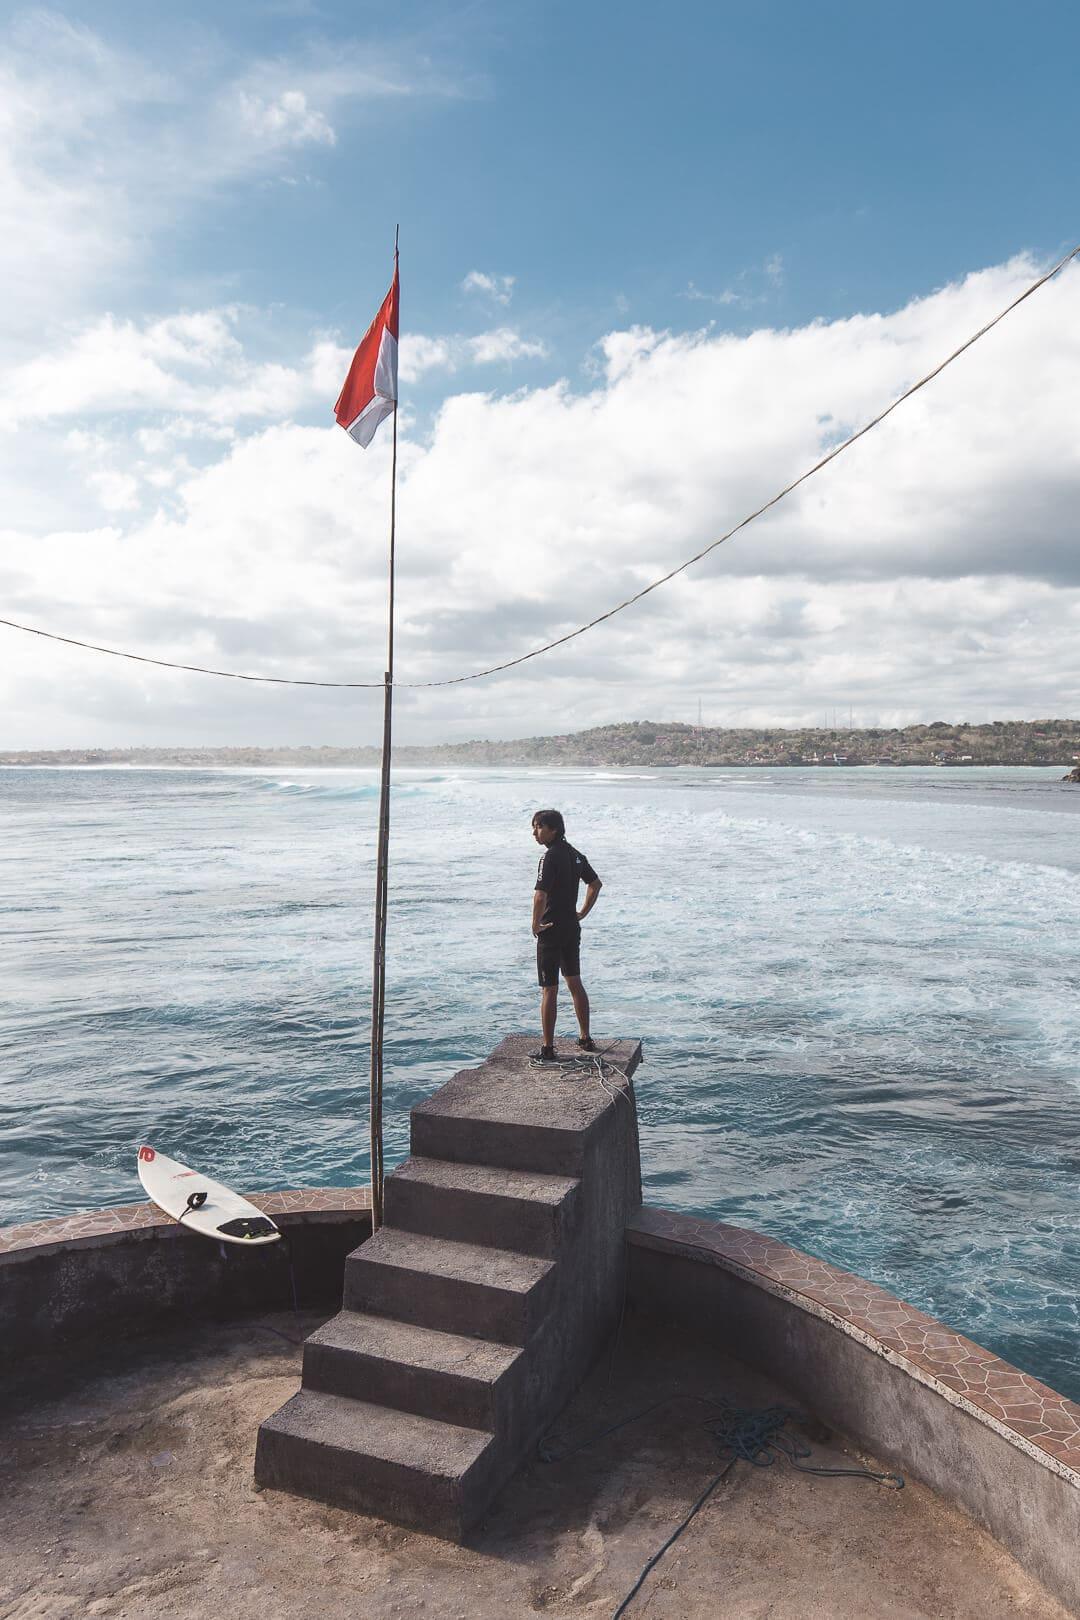 A surfer stands on the jump platform at Mahana Point on Nusa Ceningan Island